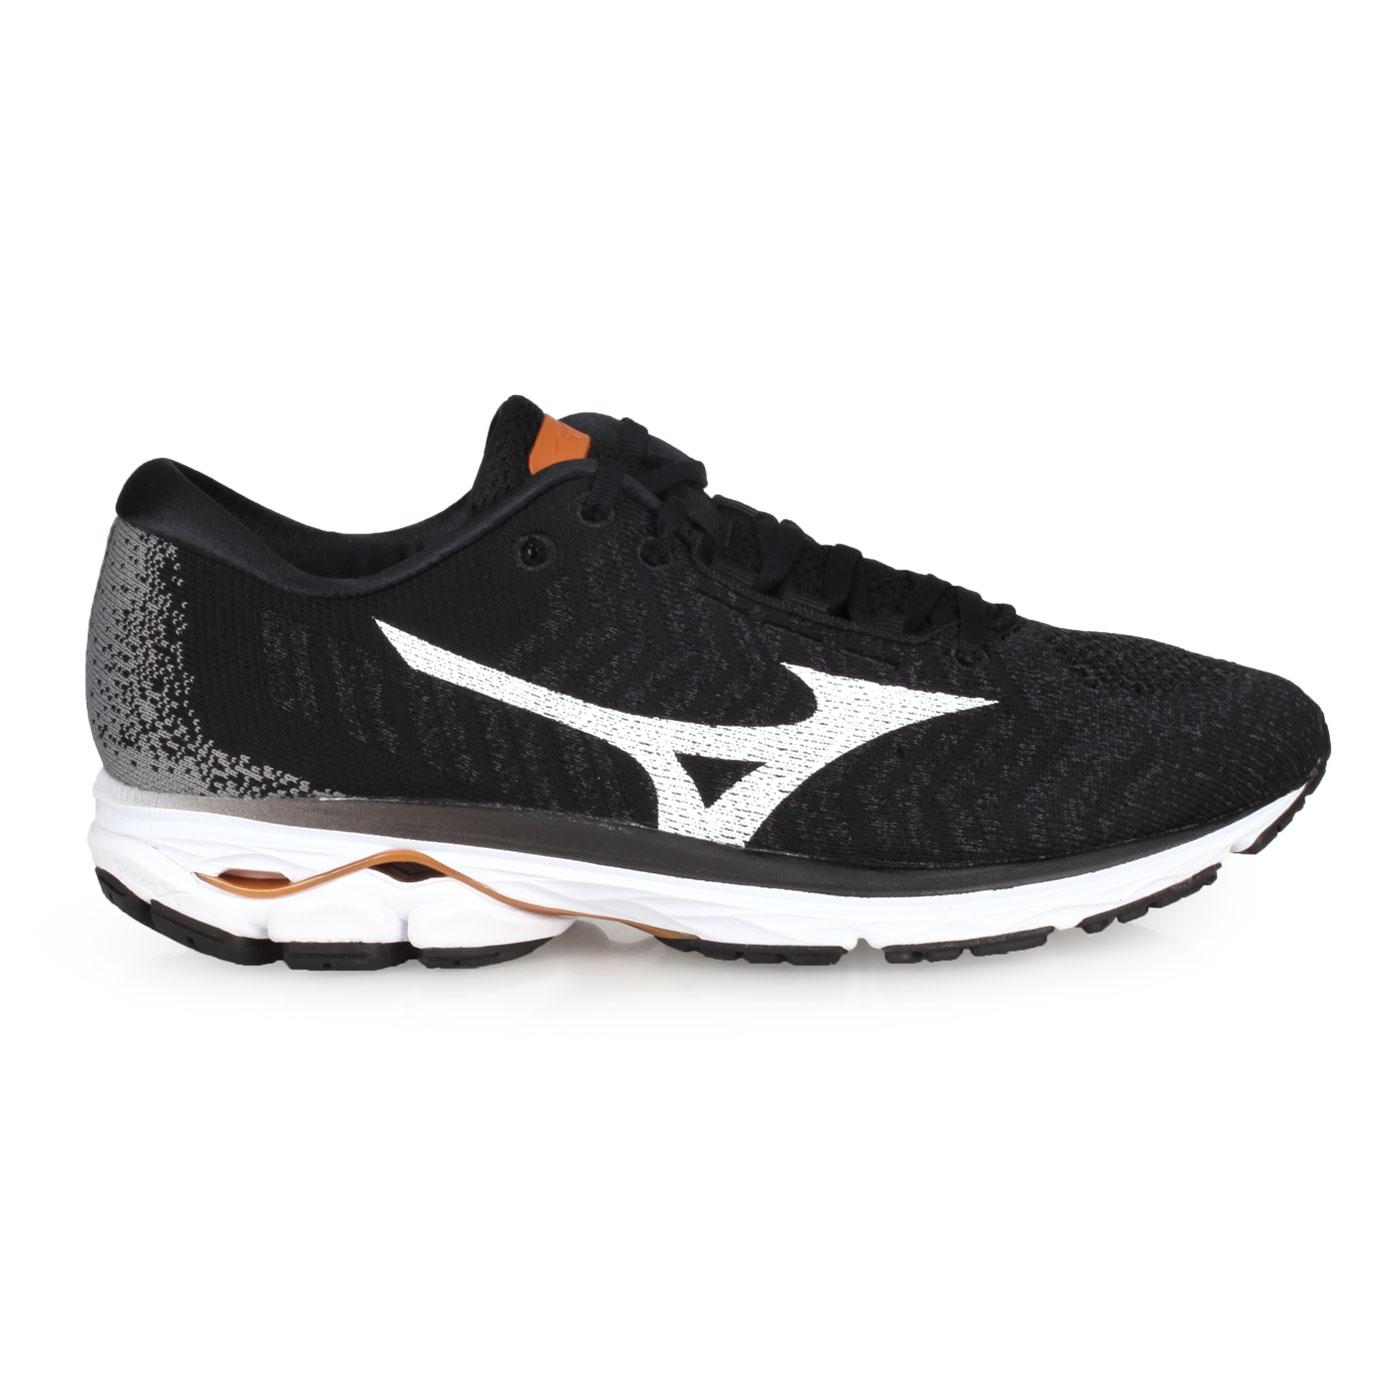 MIZUNO 男款慢跑鞋  @WAVE RIDER WAVEKNIT 3@J1GC192901 - 黑白灰